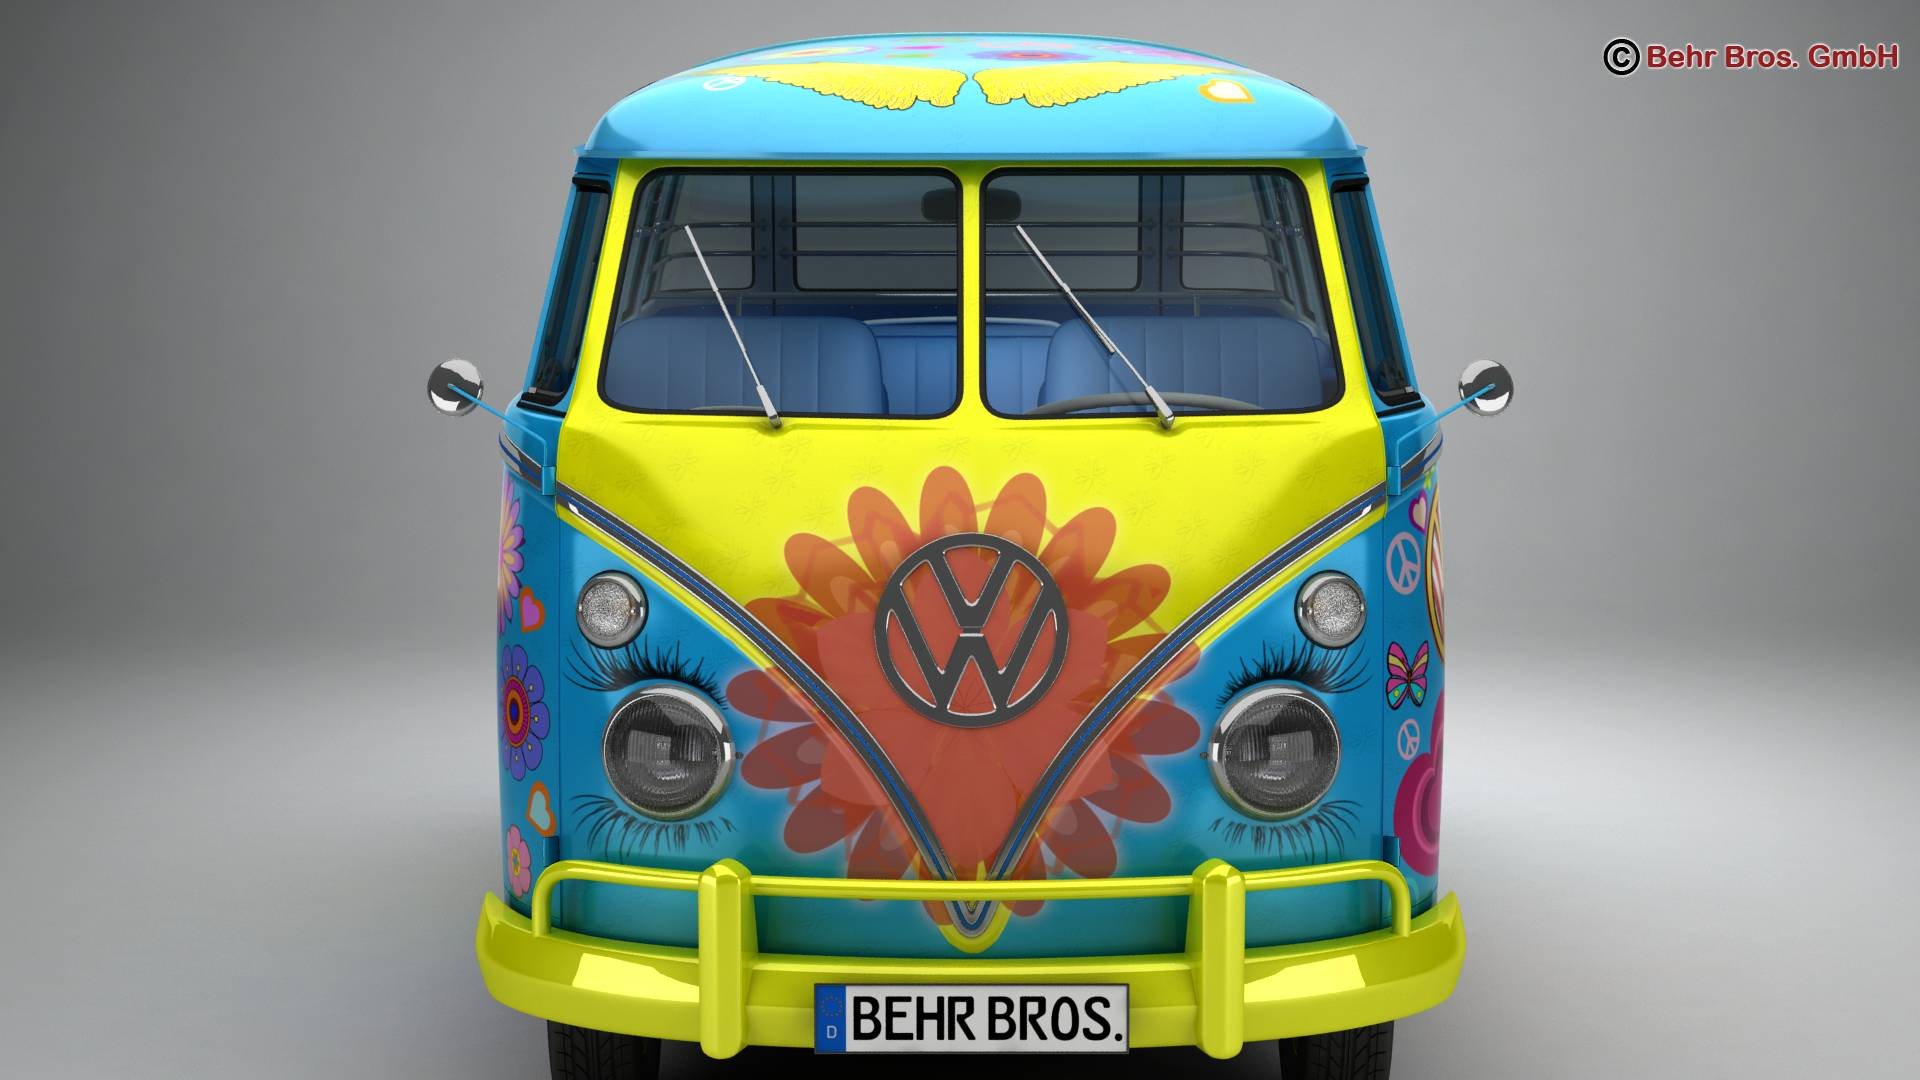 volkswagen type 2 samba 1963 hippie 3d model 3ds max fbx c4d lwo ma mb obj 217247